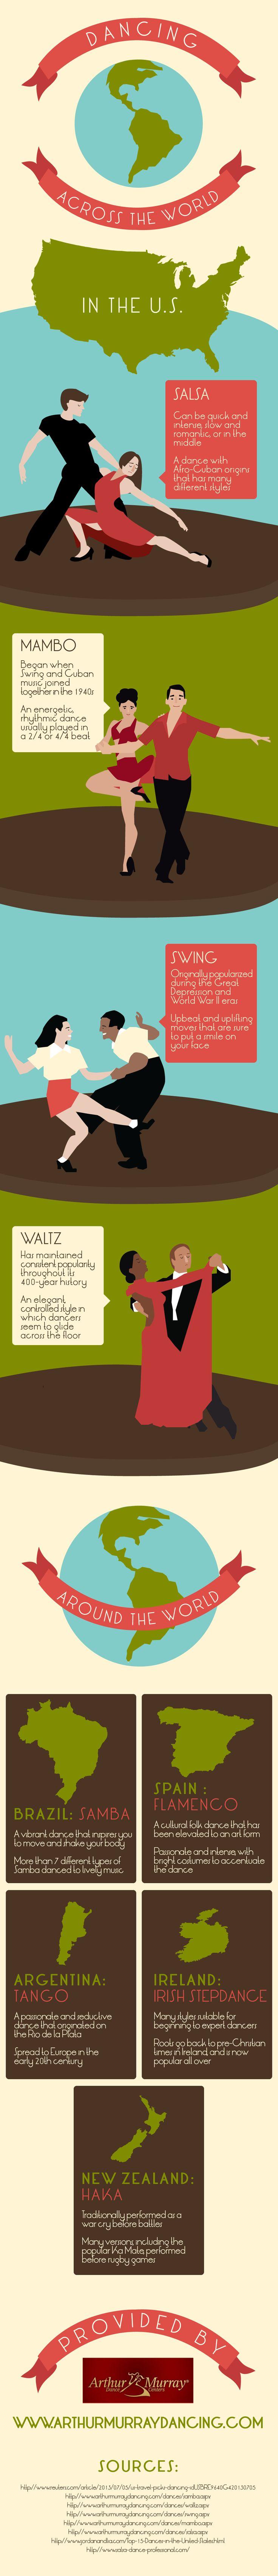 Dancing Across the World   #Infographic #Dancing